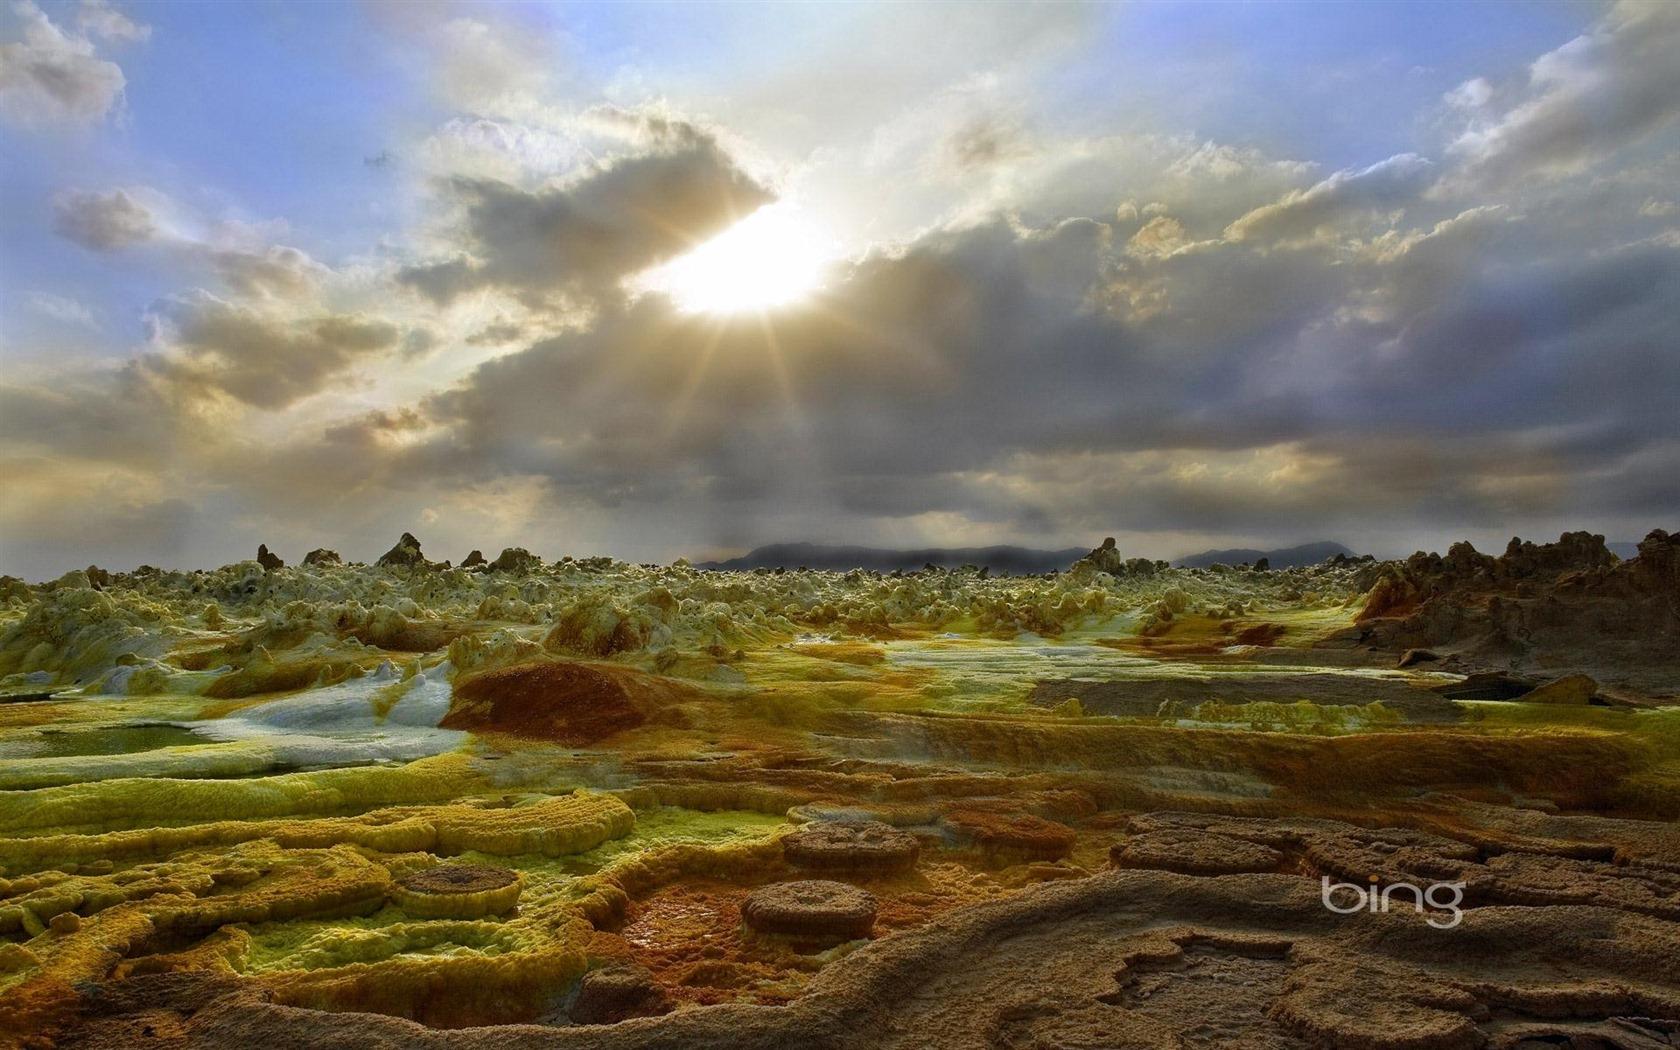 Windows Theme 7 Bing le soleil cran large cran HD   1680x1050 1680x1050